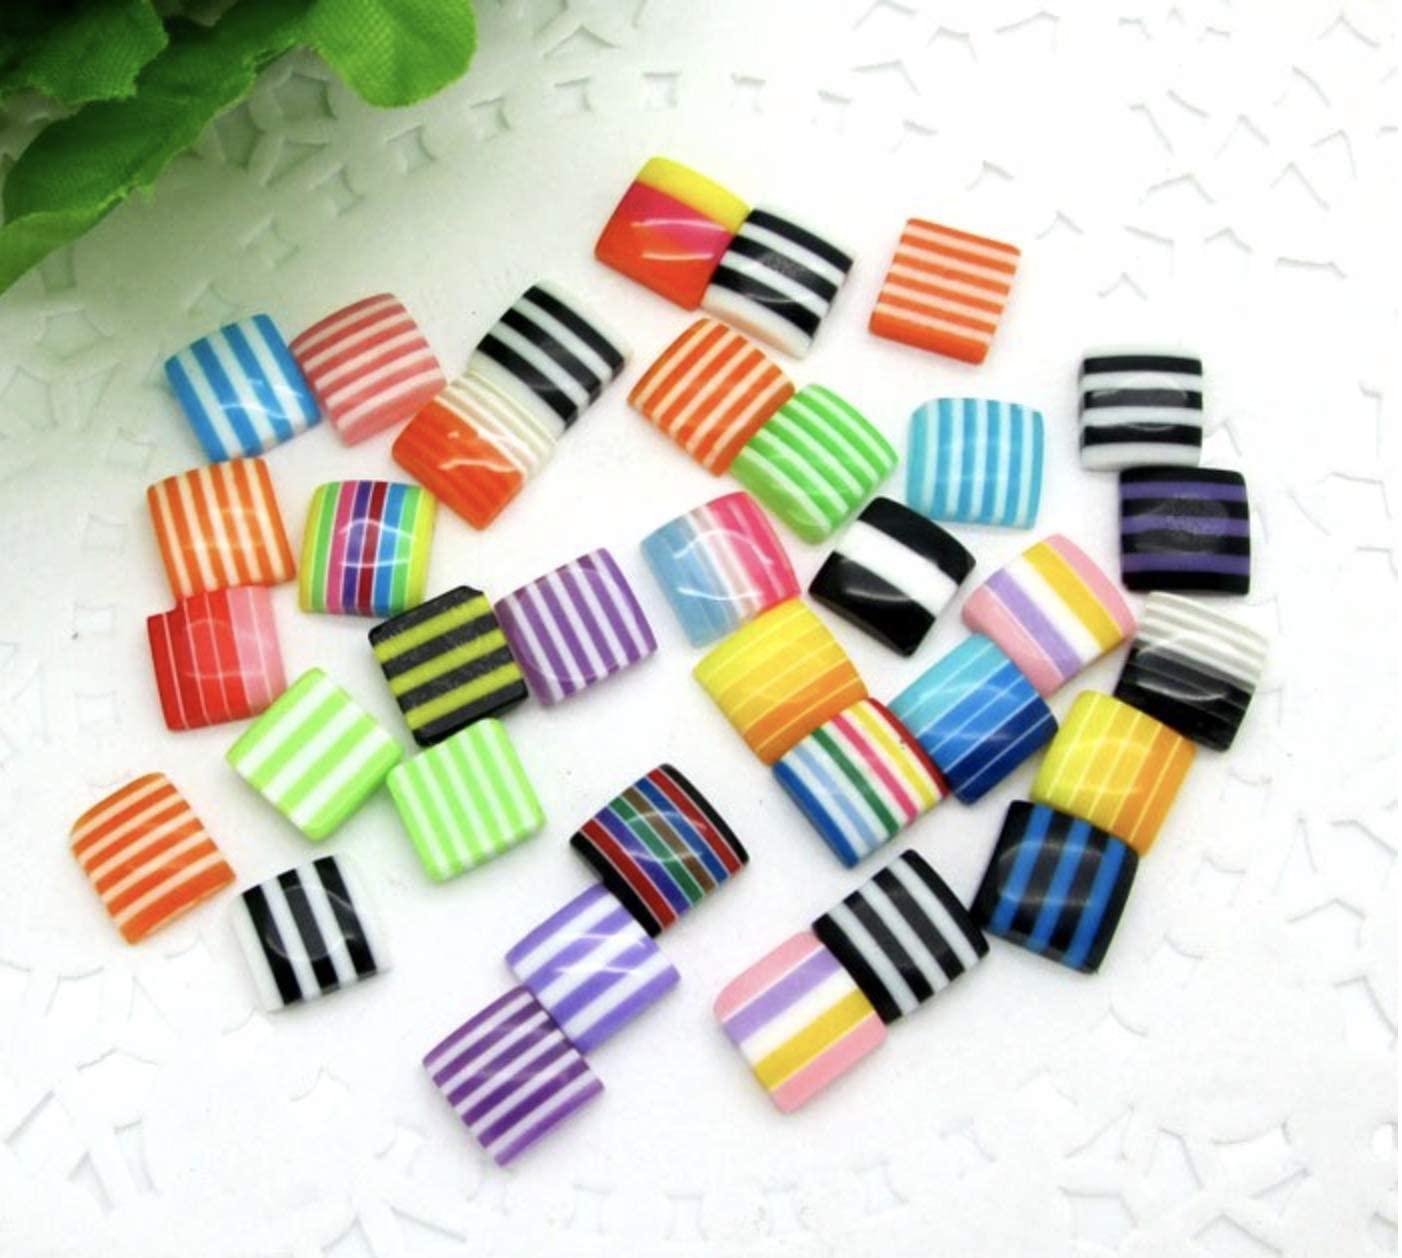 50pcs 8mm / 10mm Rainbow Stripe Square Resin Flatback Cabochons Colourful Retro Beads Scrapbooking (10mm - F917)